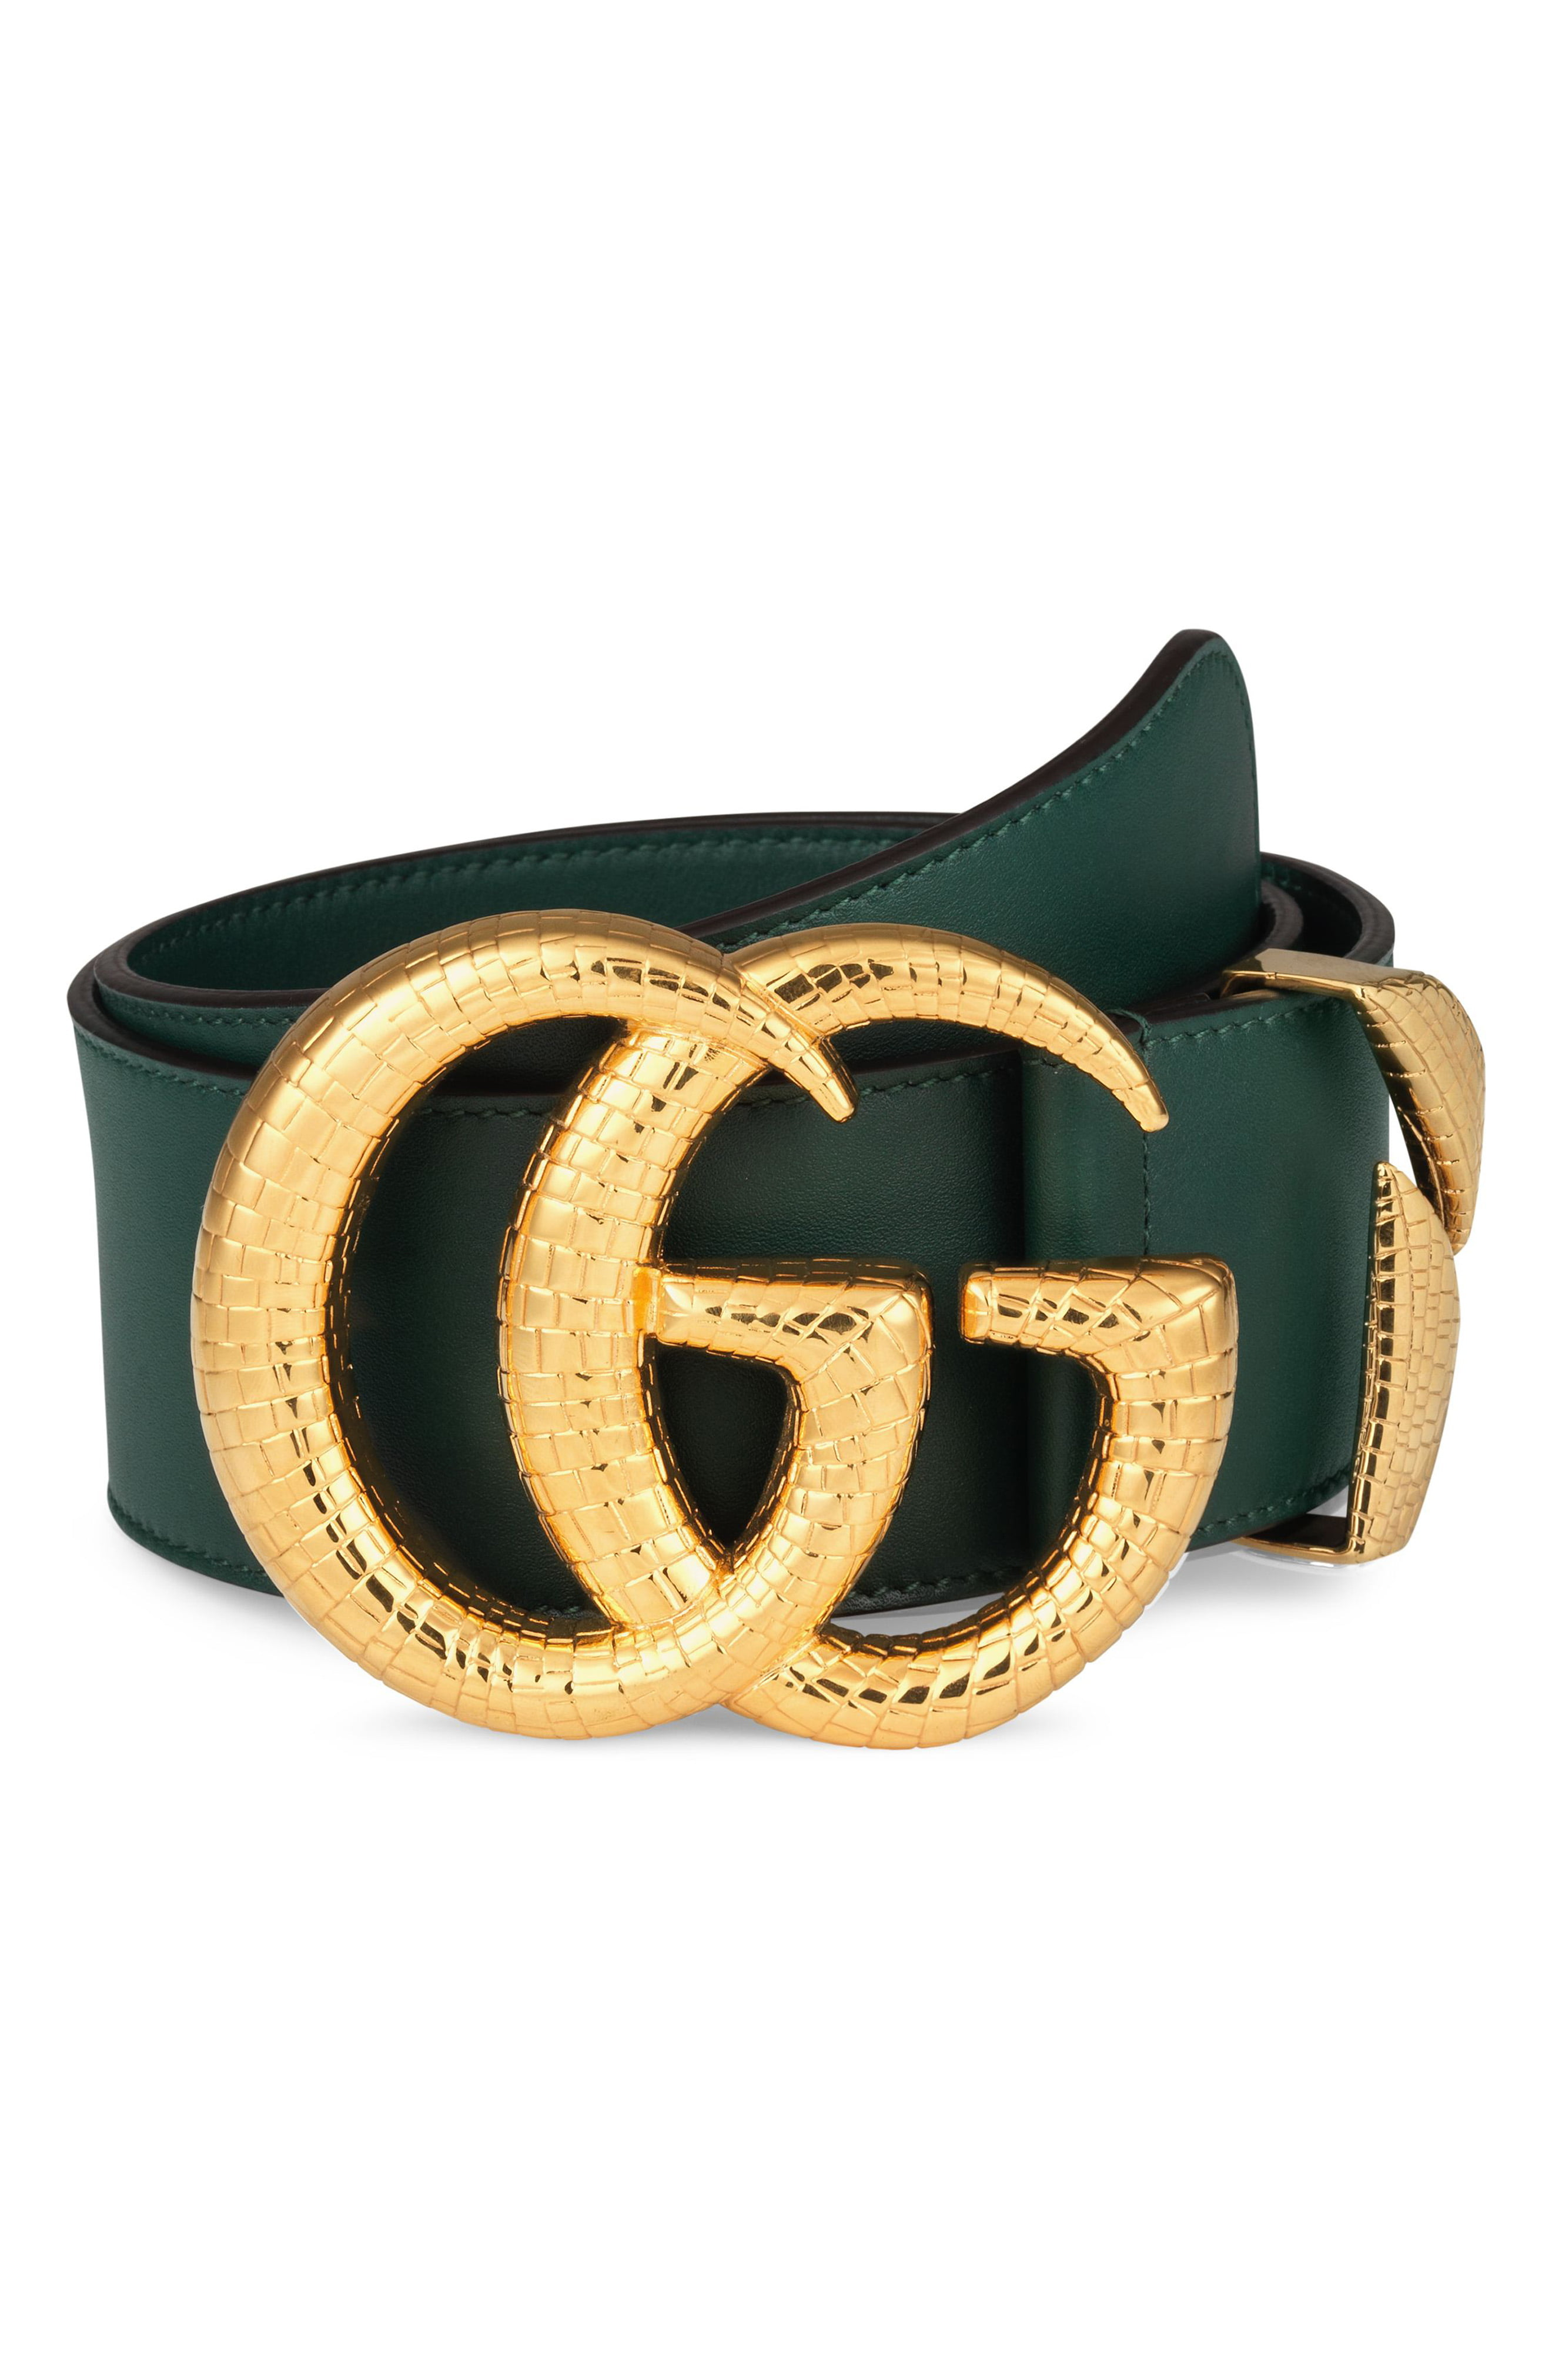 0a261e201 Women's Gucci Gg Marmont Lizard Buckle Leather Belt, Size 85 - Vintage Green